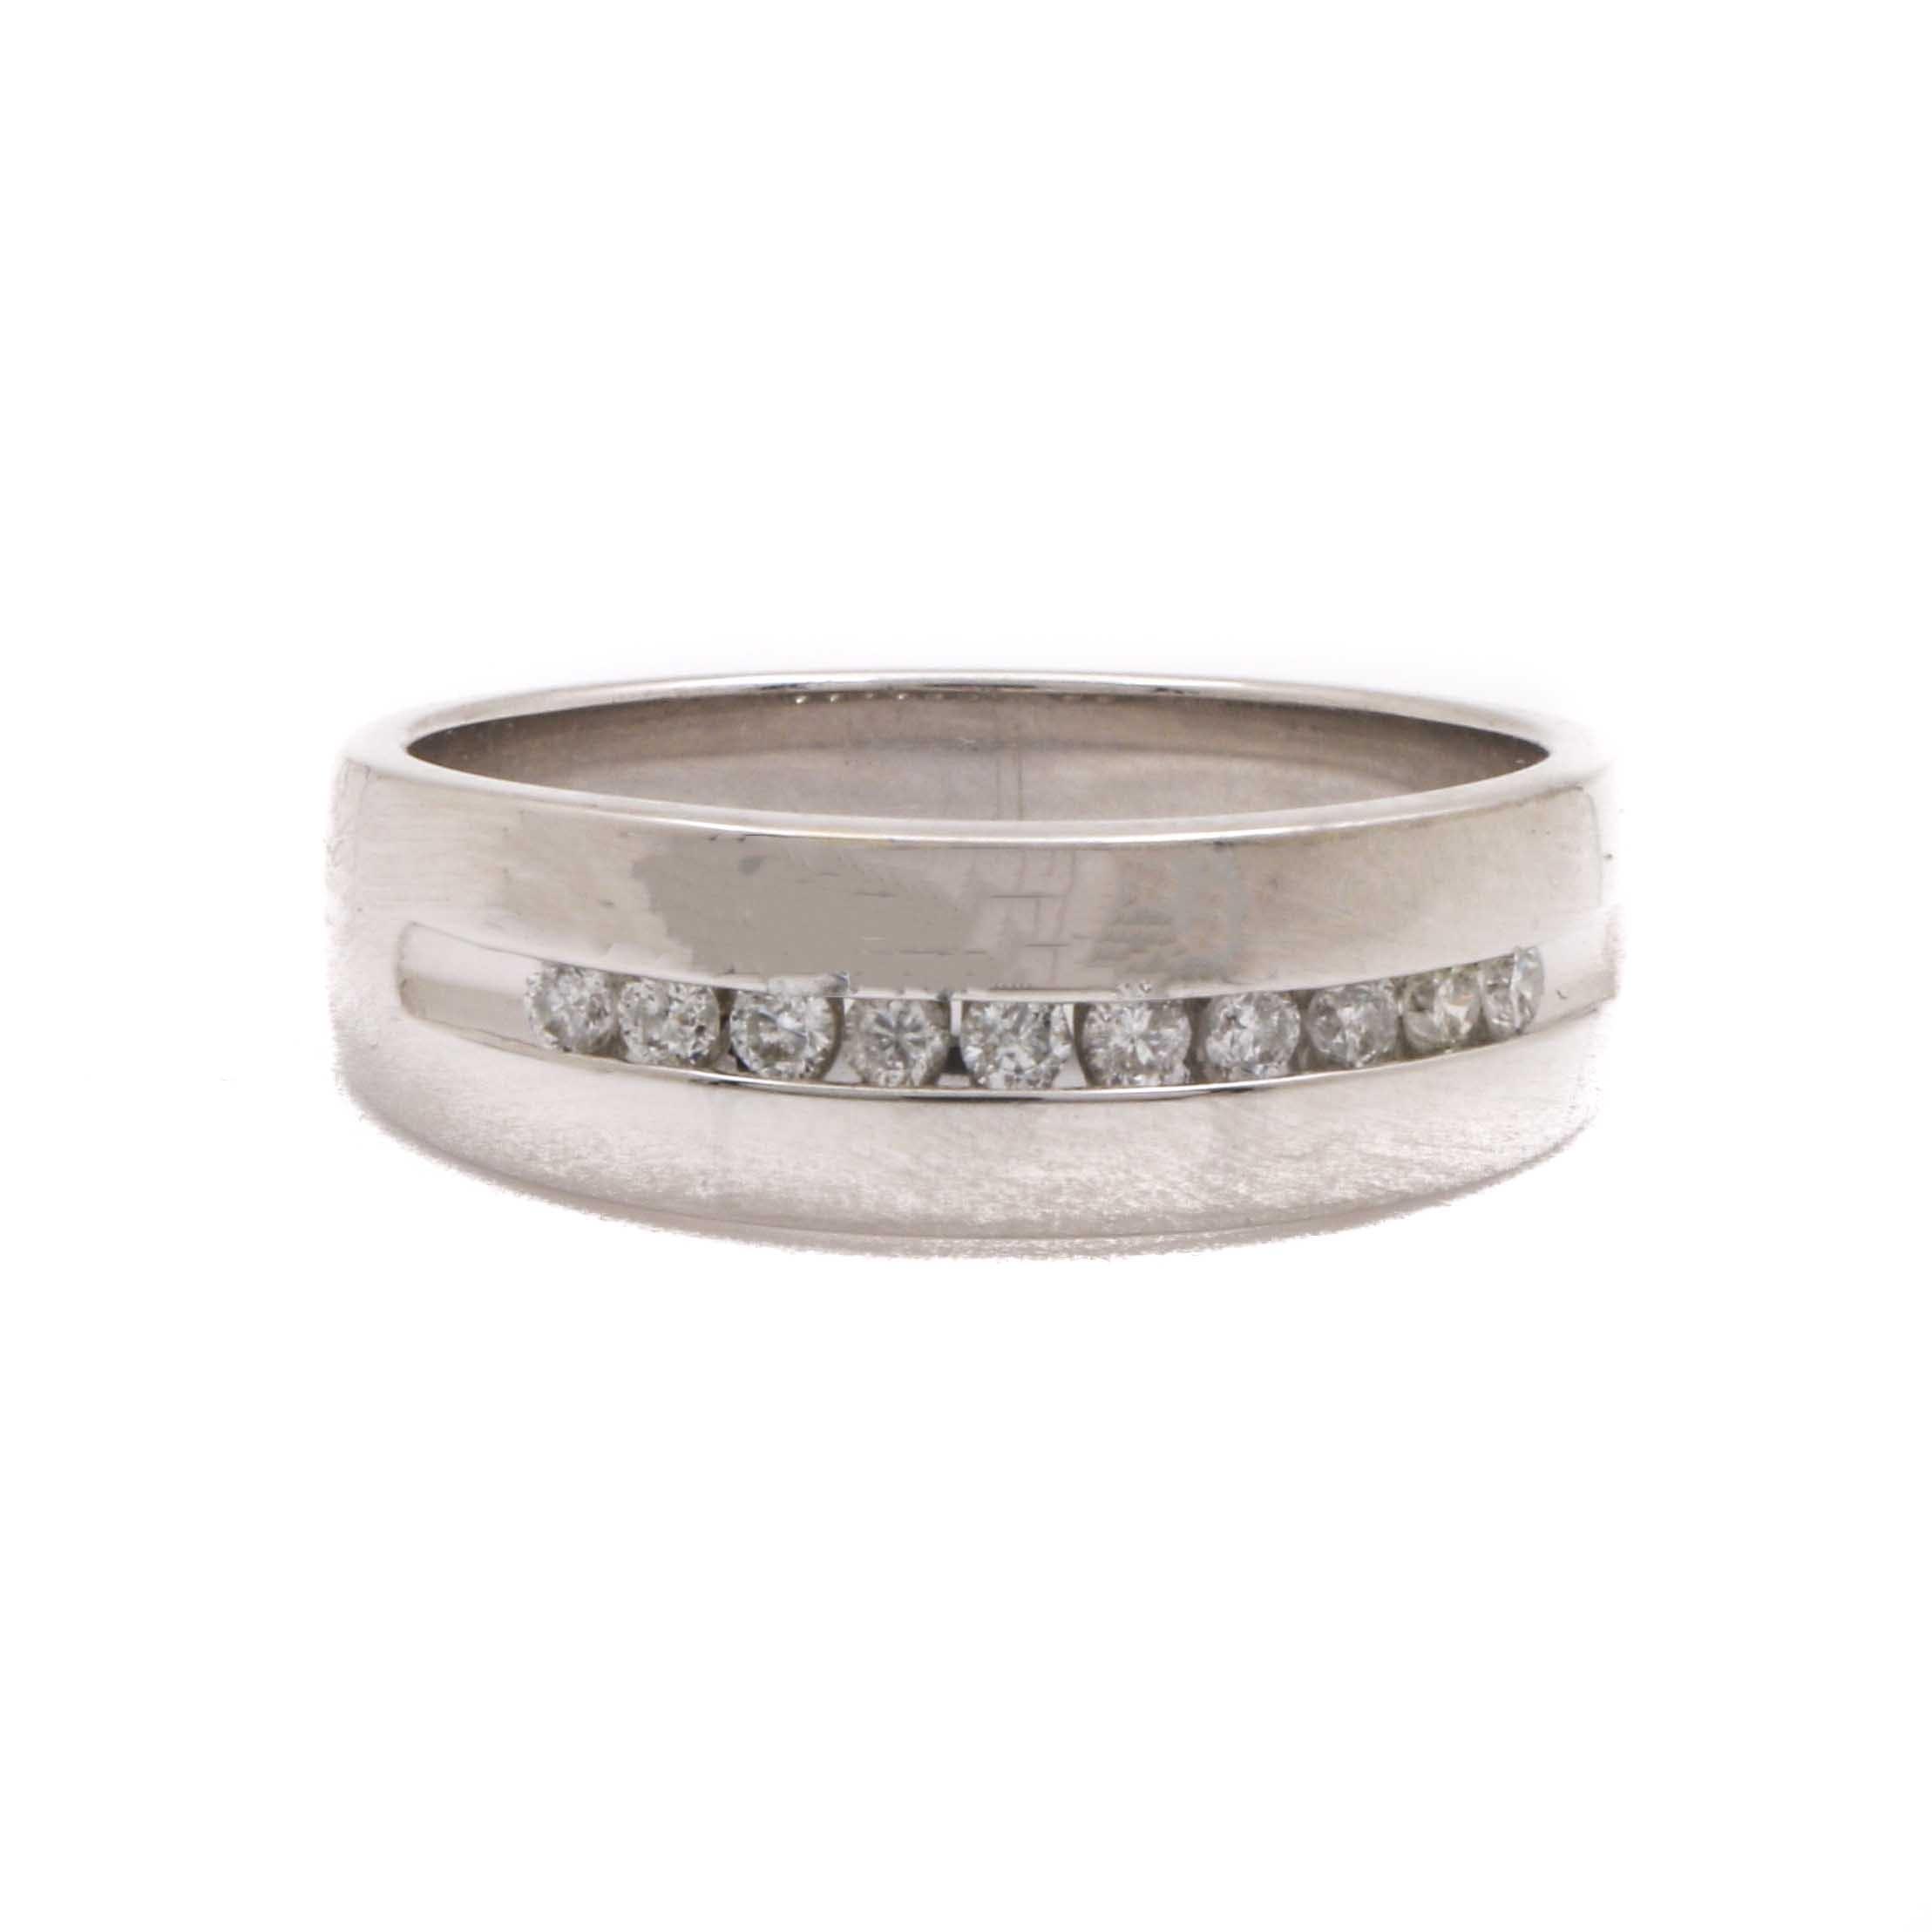 14K White Gold Diamond Ring Band